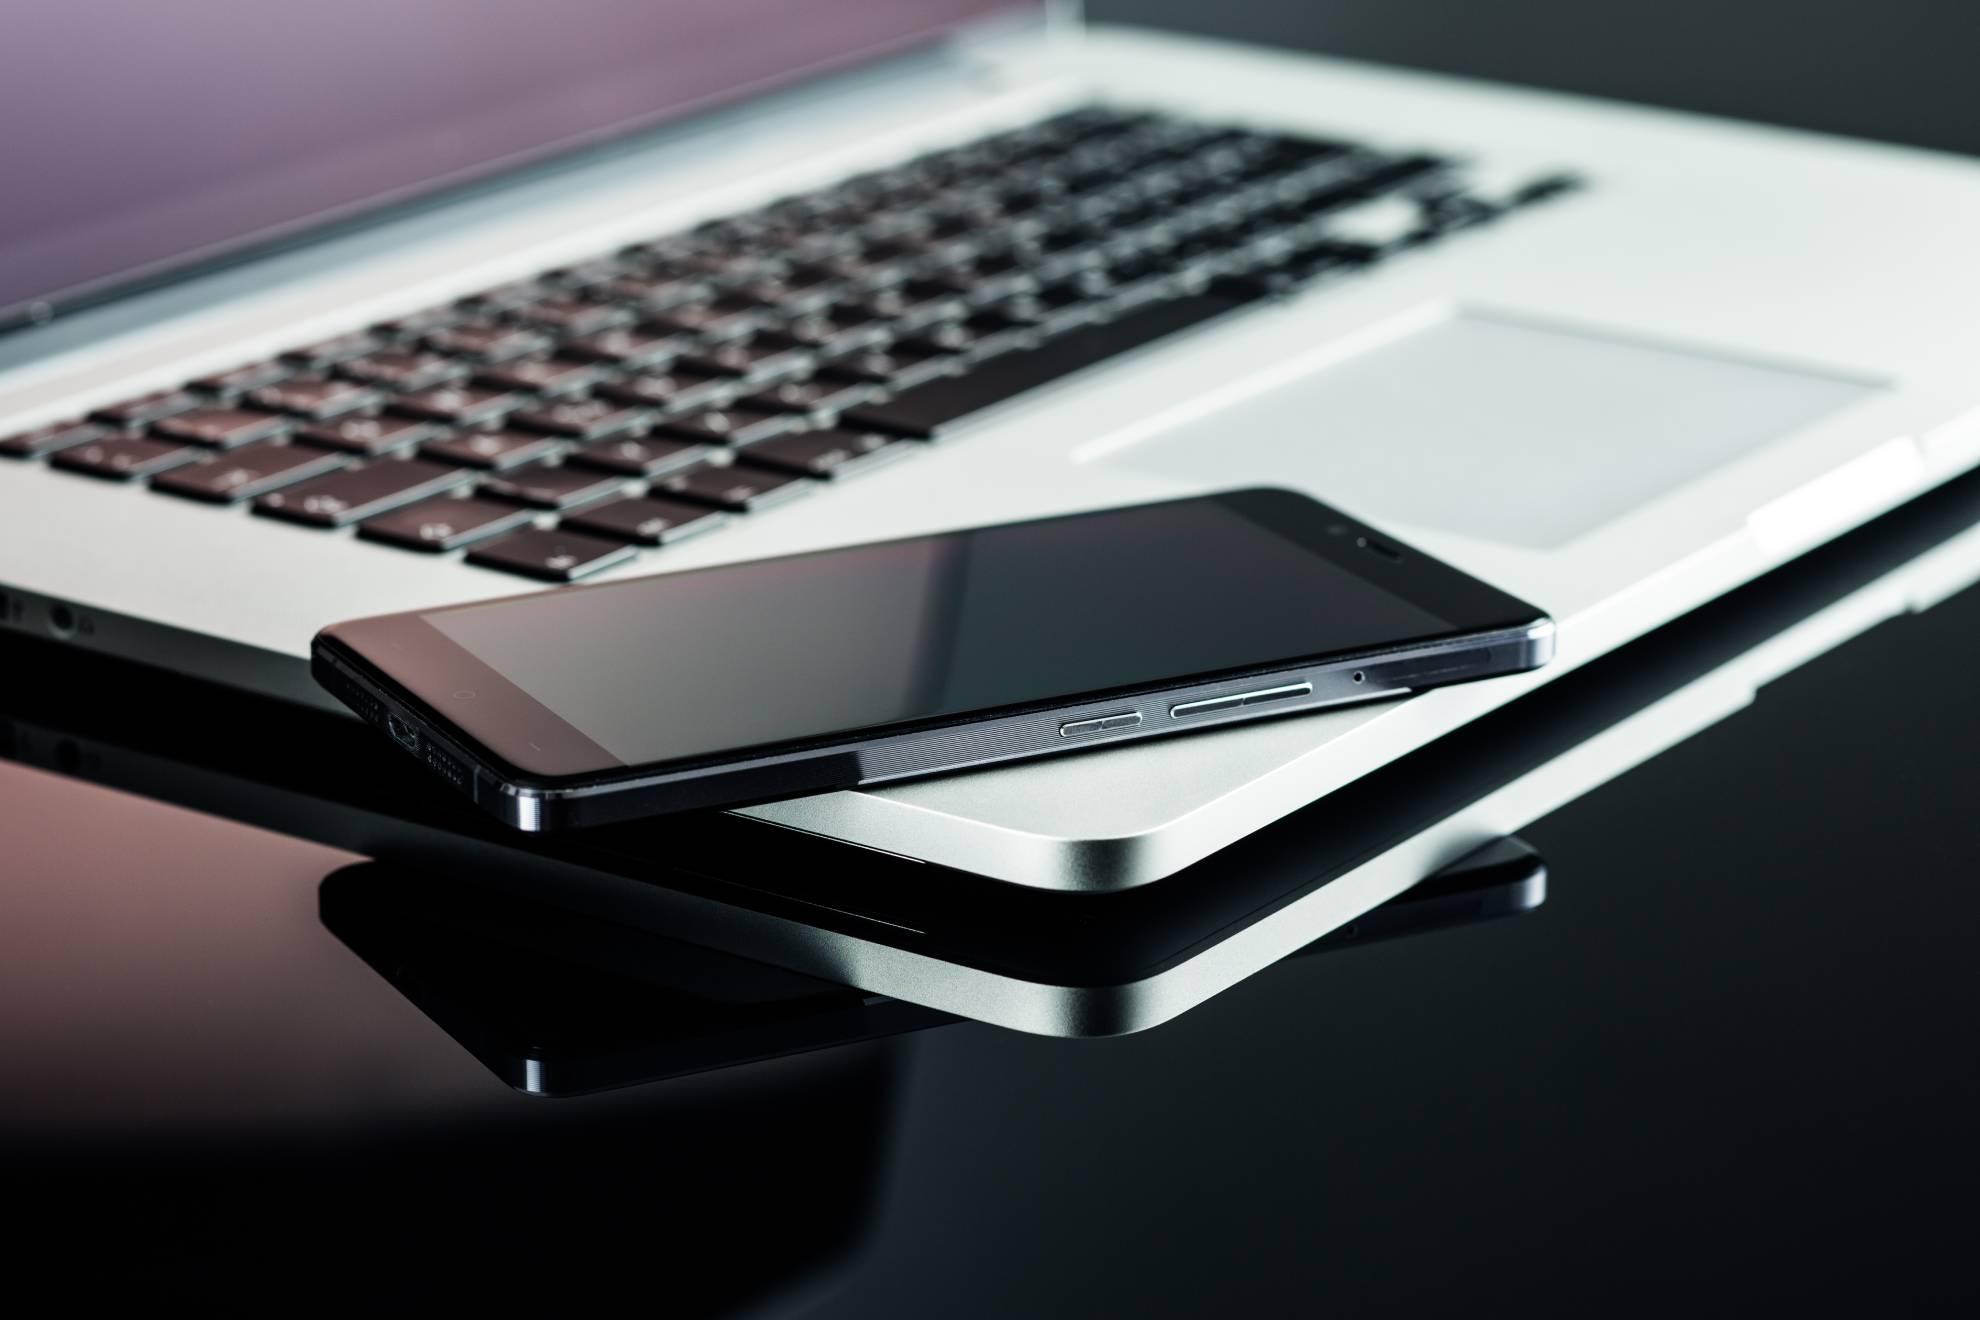 smartphone-and-laptop-PKFPYV7 (1)